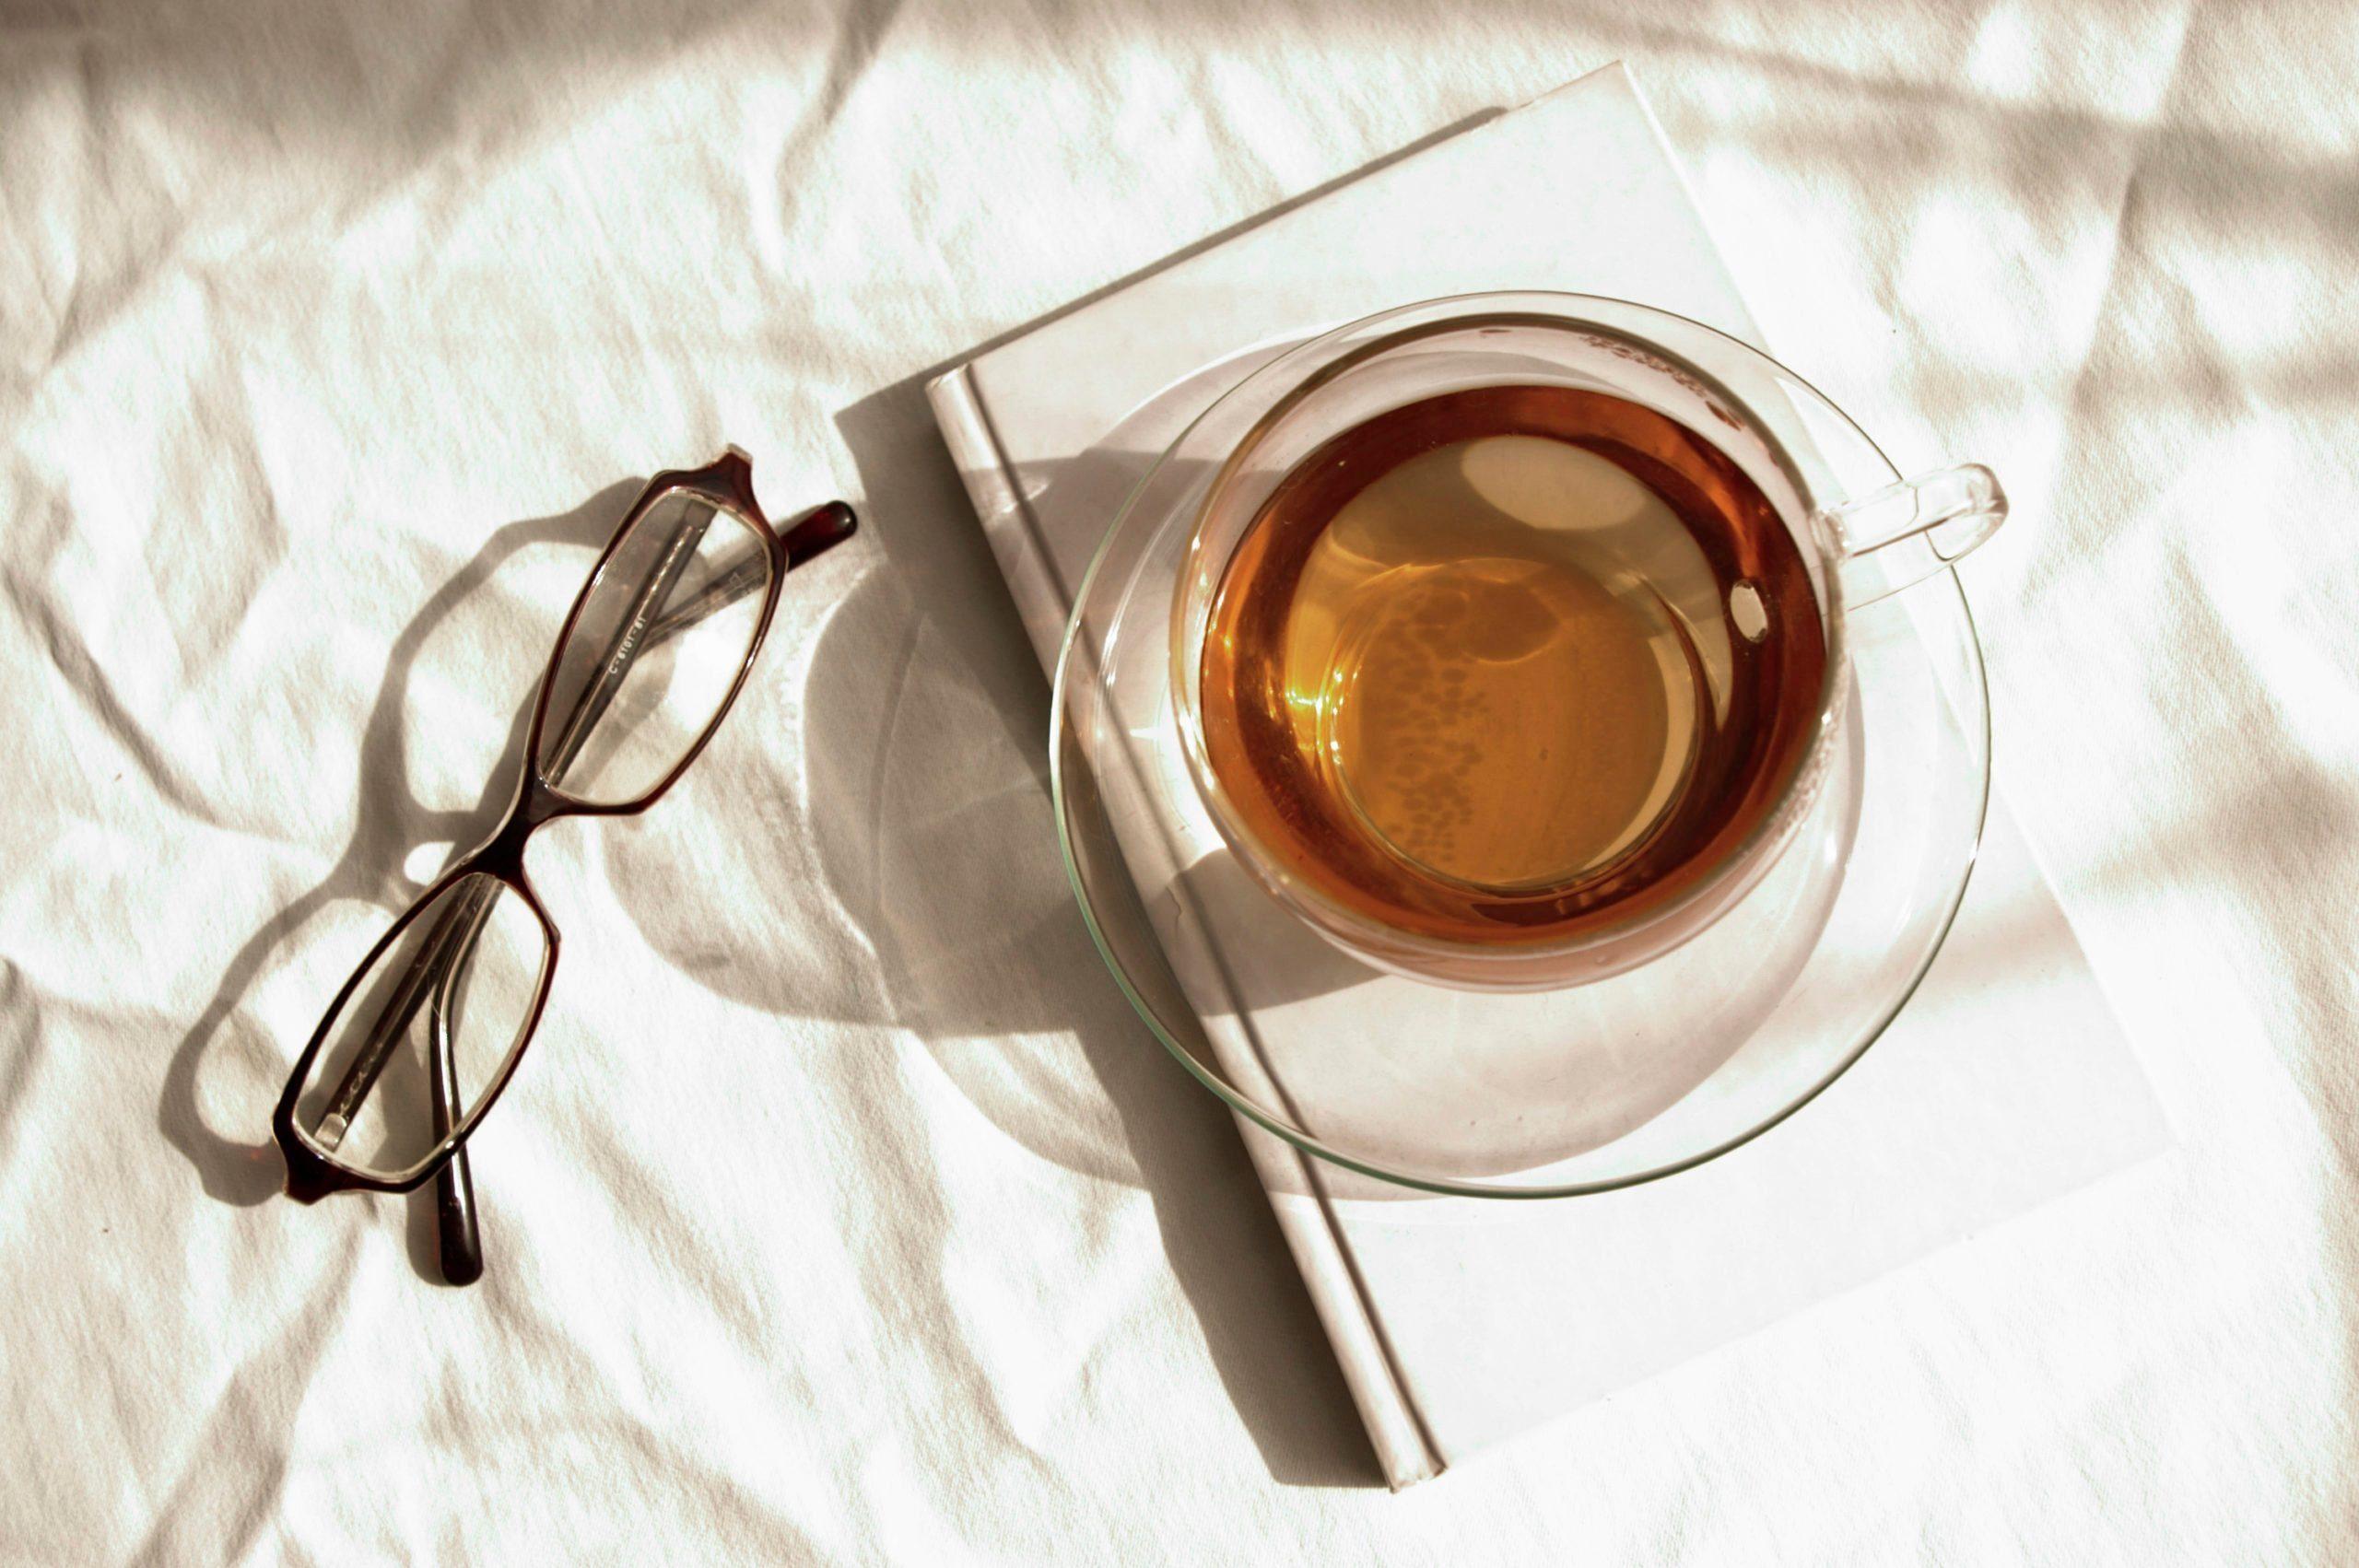 Tea break time